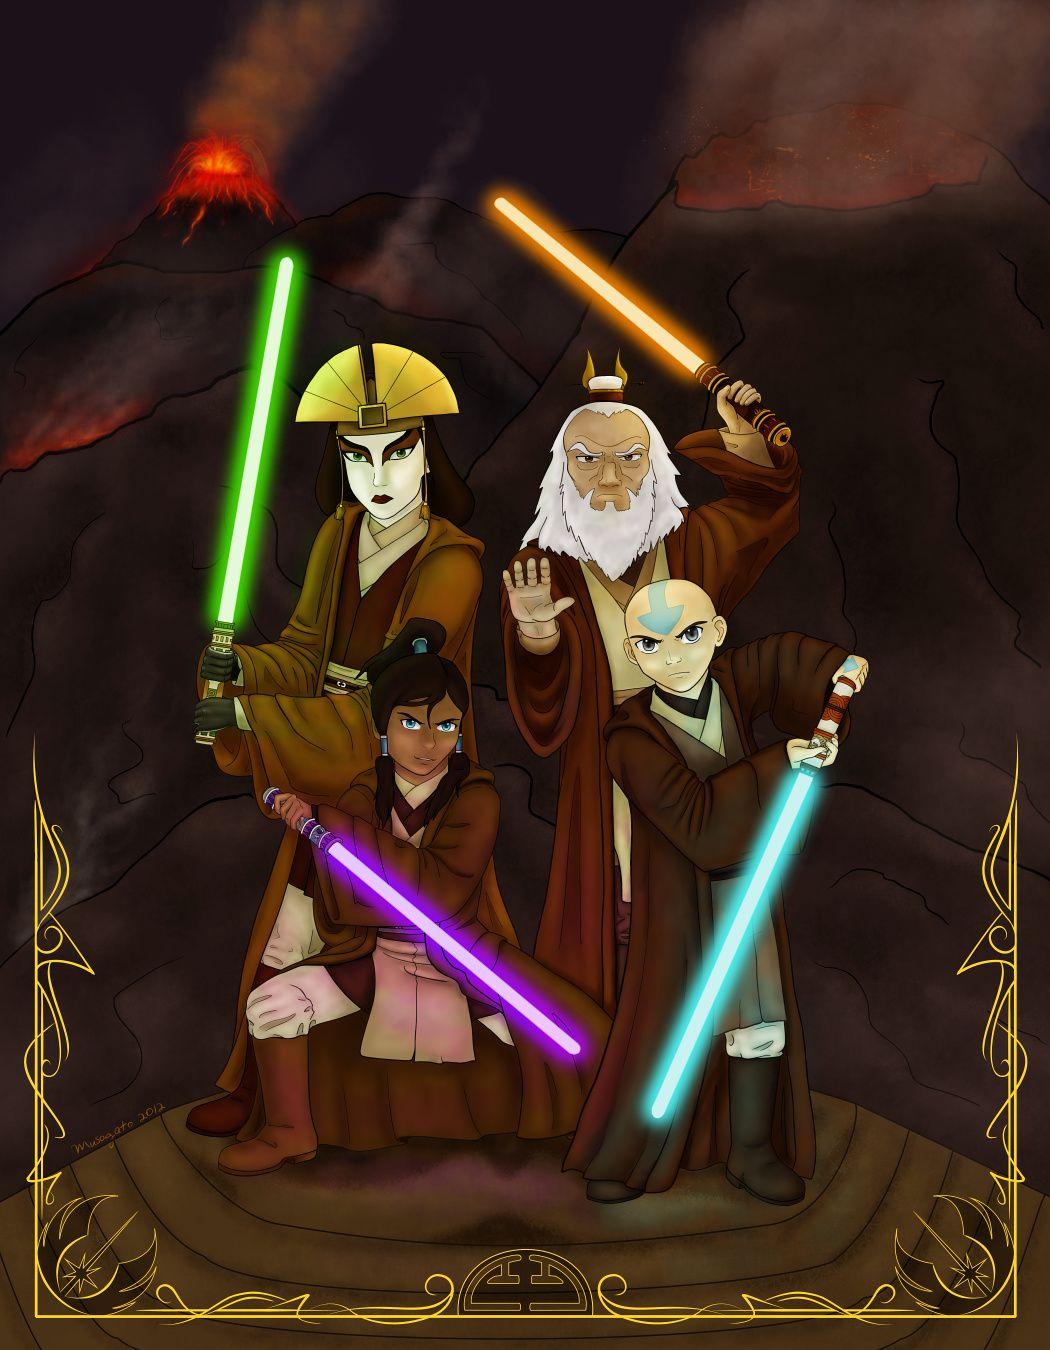 Avatar Jedi Council By Musogato On Deviantart Avatar The Last Airbender Legend Of Korra With Avatars Kyoshi Ro Star Wars Concept Art Star Wars Parody Avatar